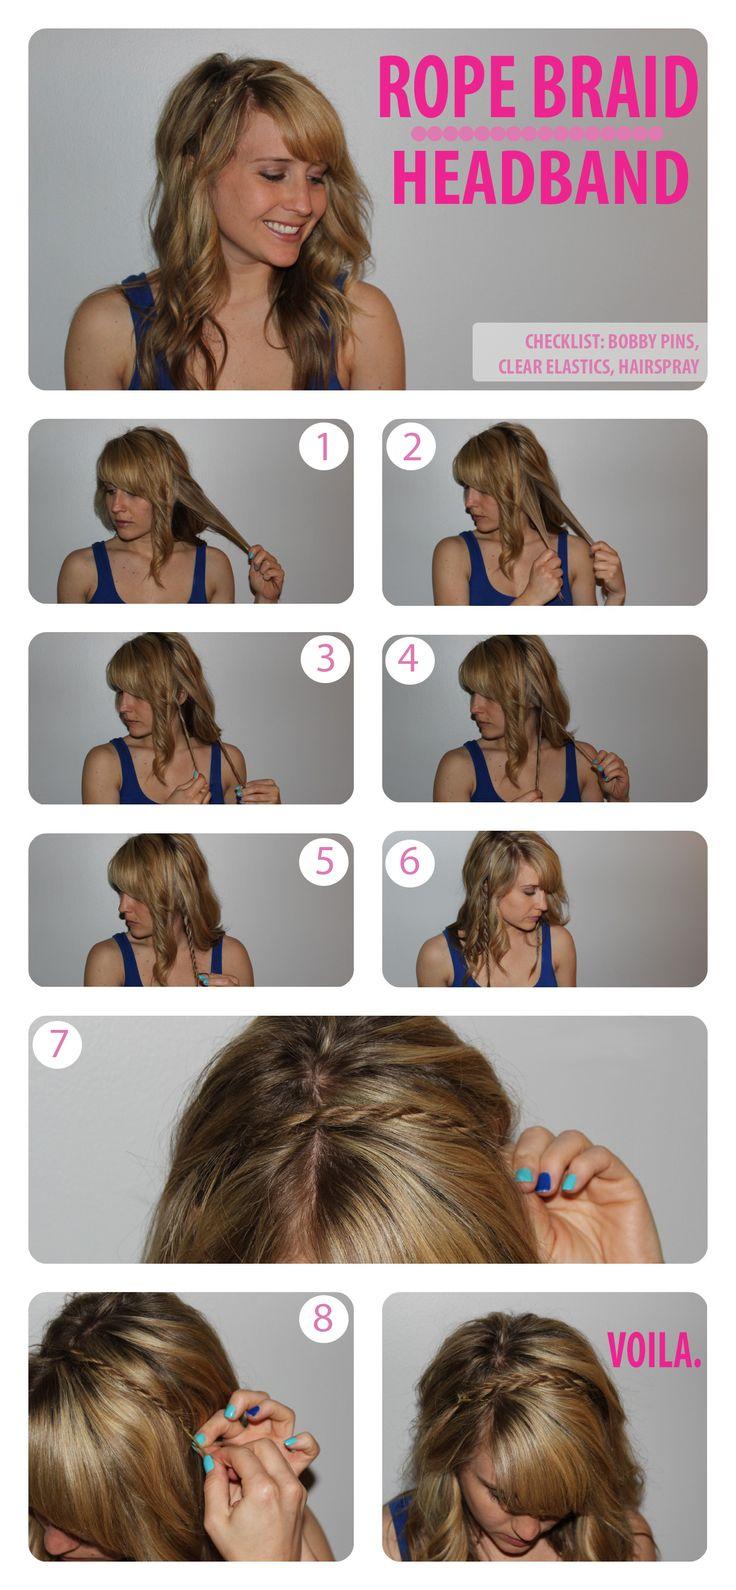 headband braid tutorial - photo #7